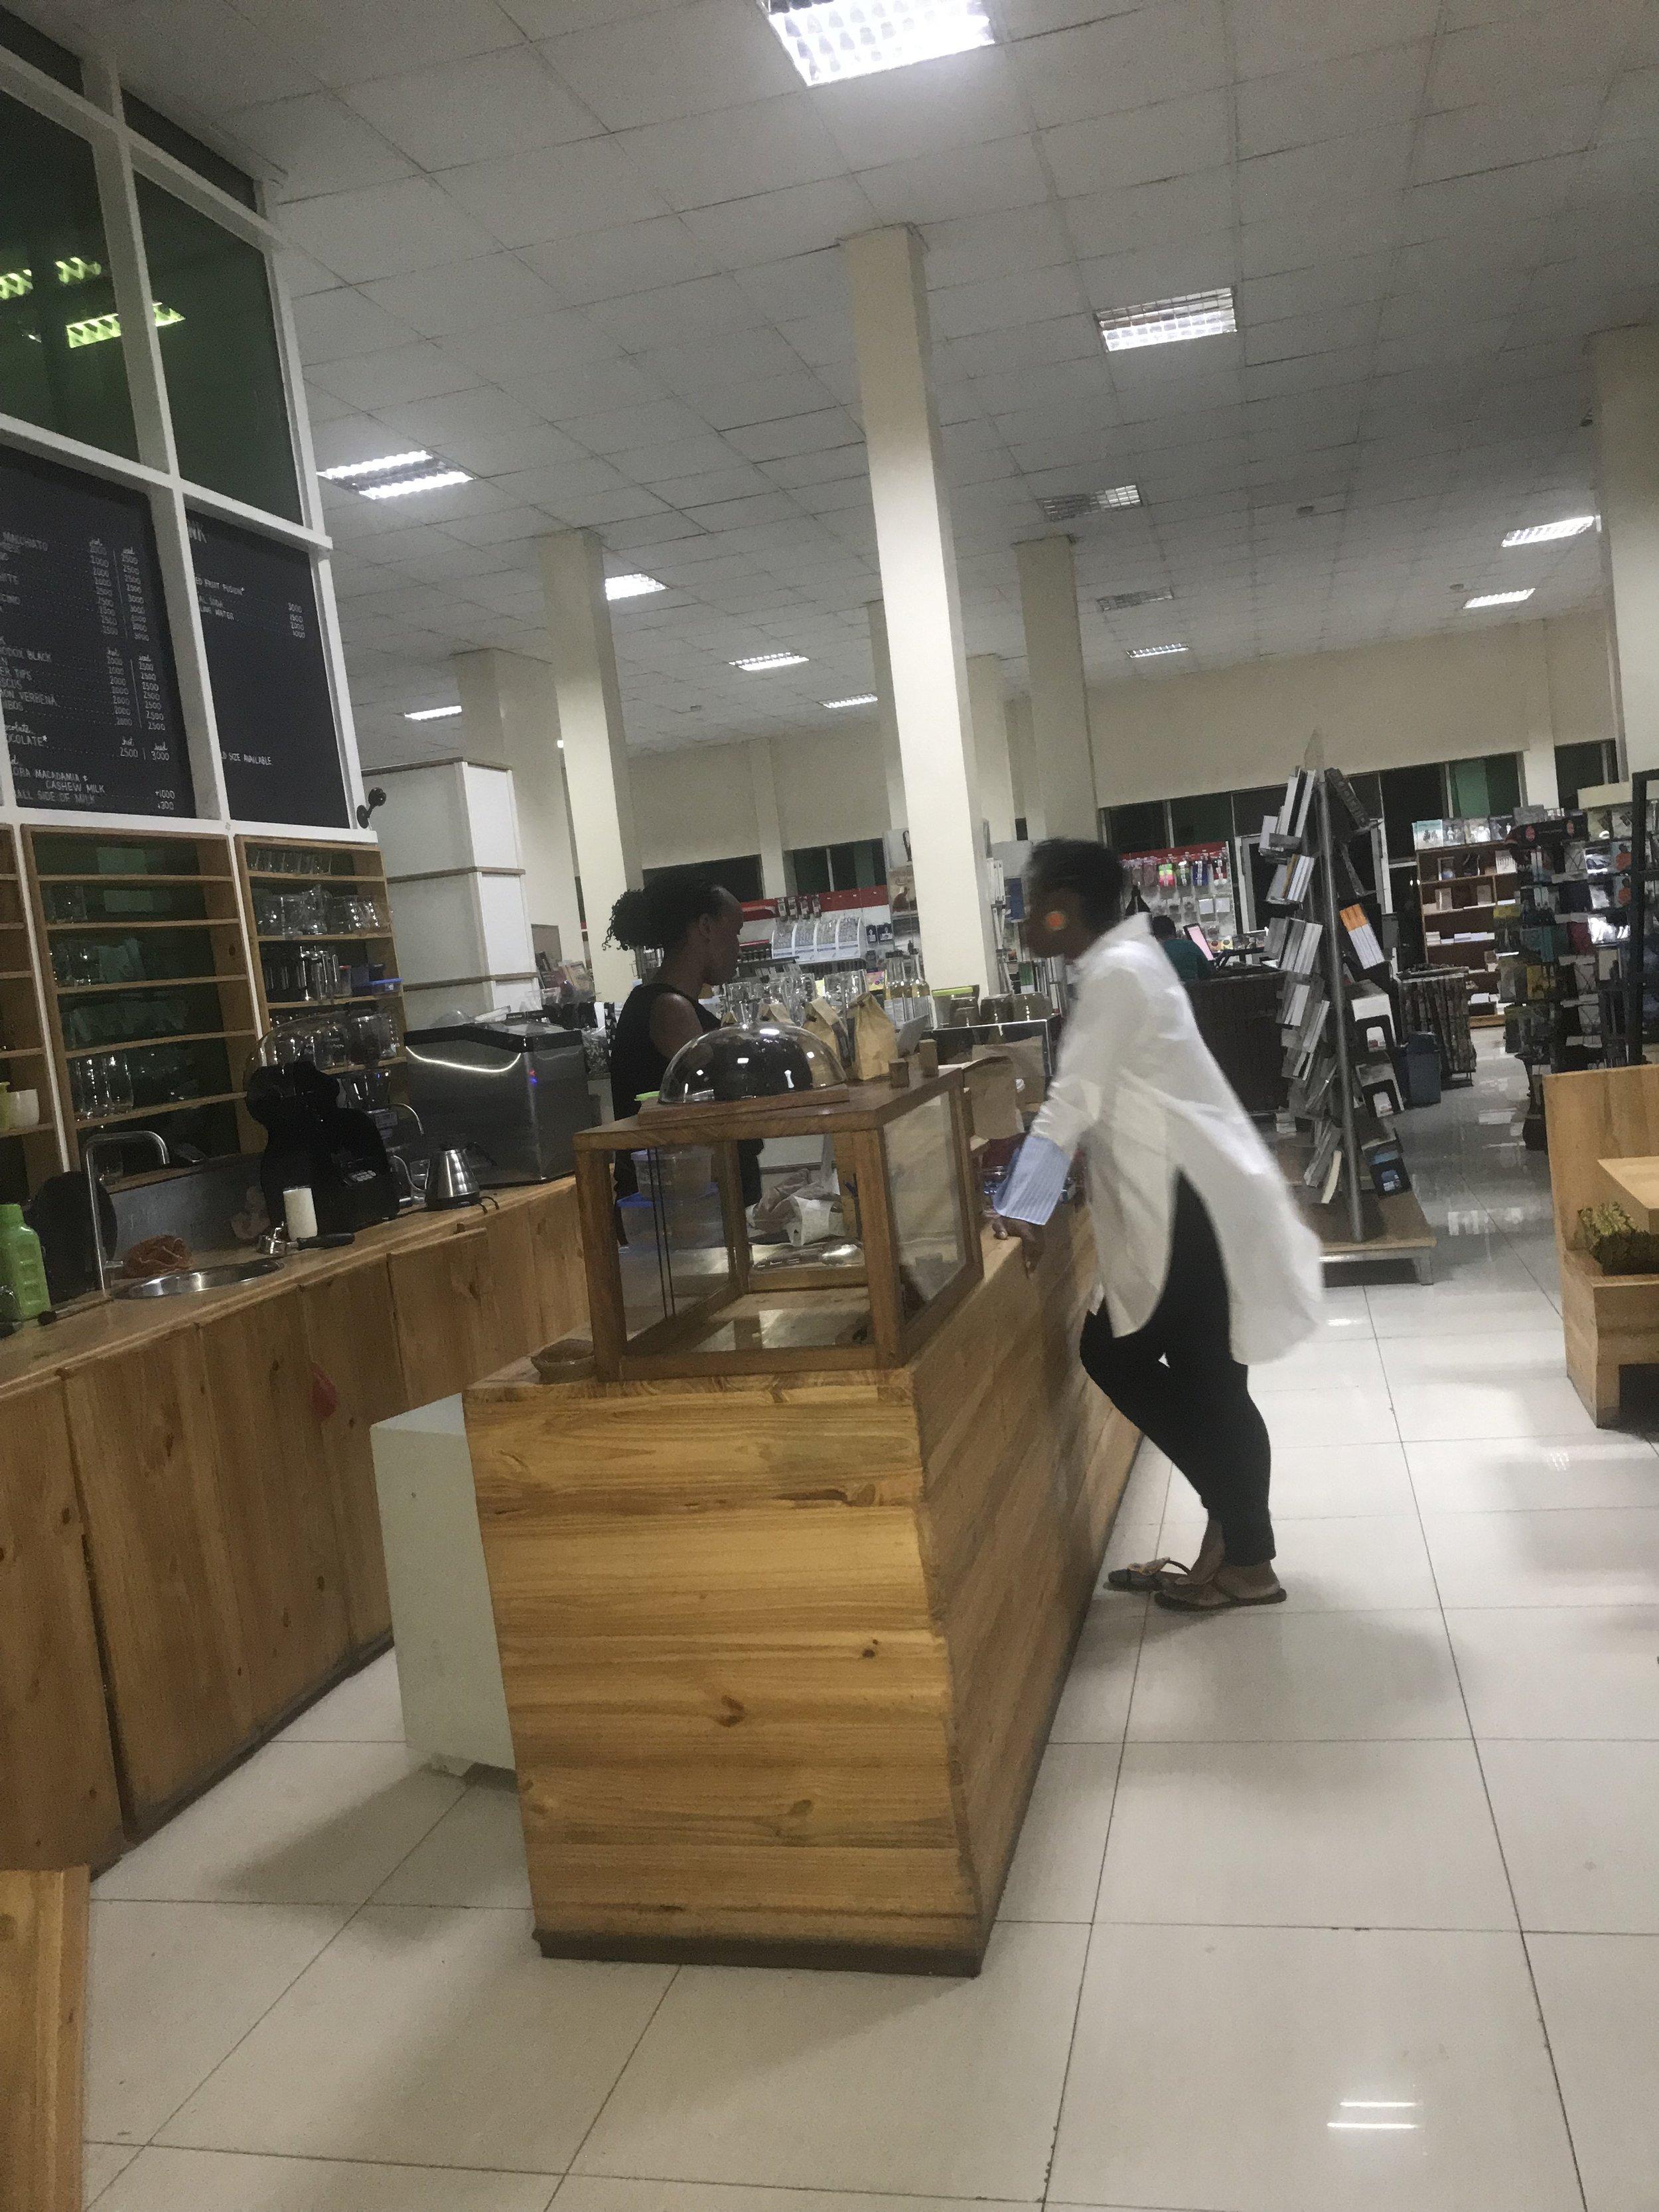 IMG_6219 2VickieRemoe-travel-kigali-rwanda-review-kwibohora25-hotels-africa.JPG